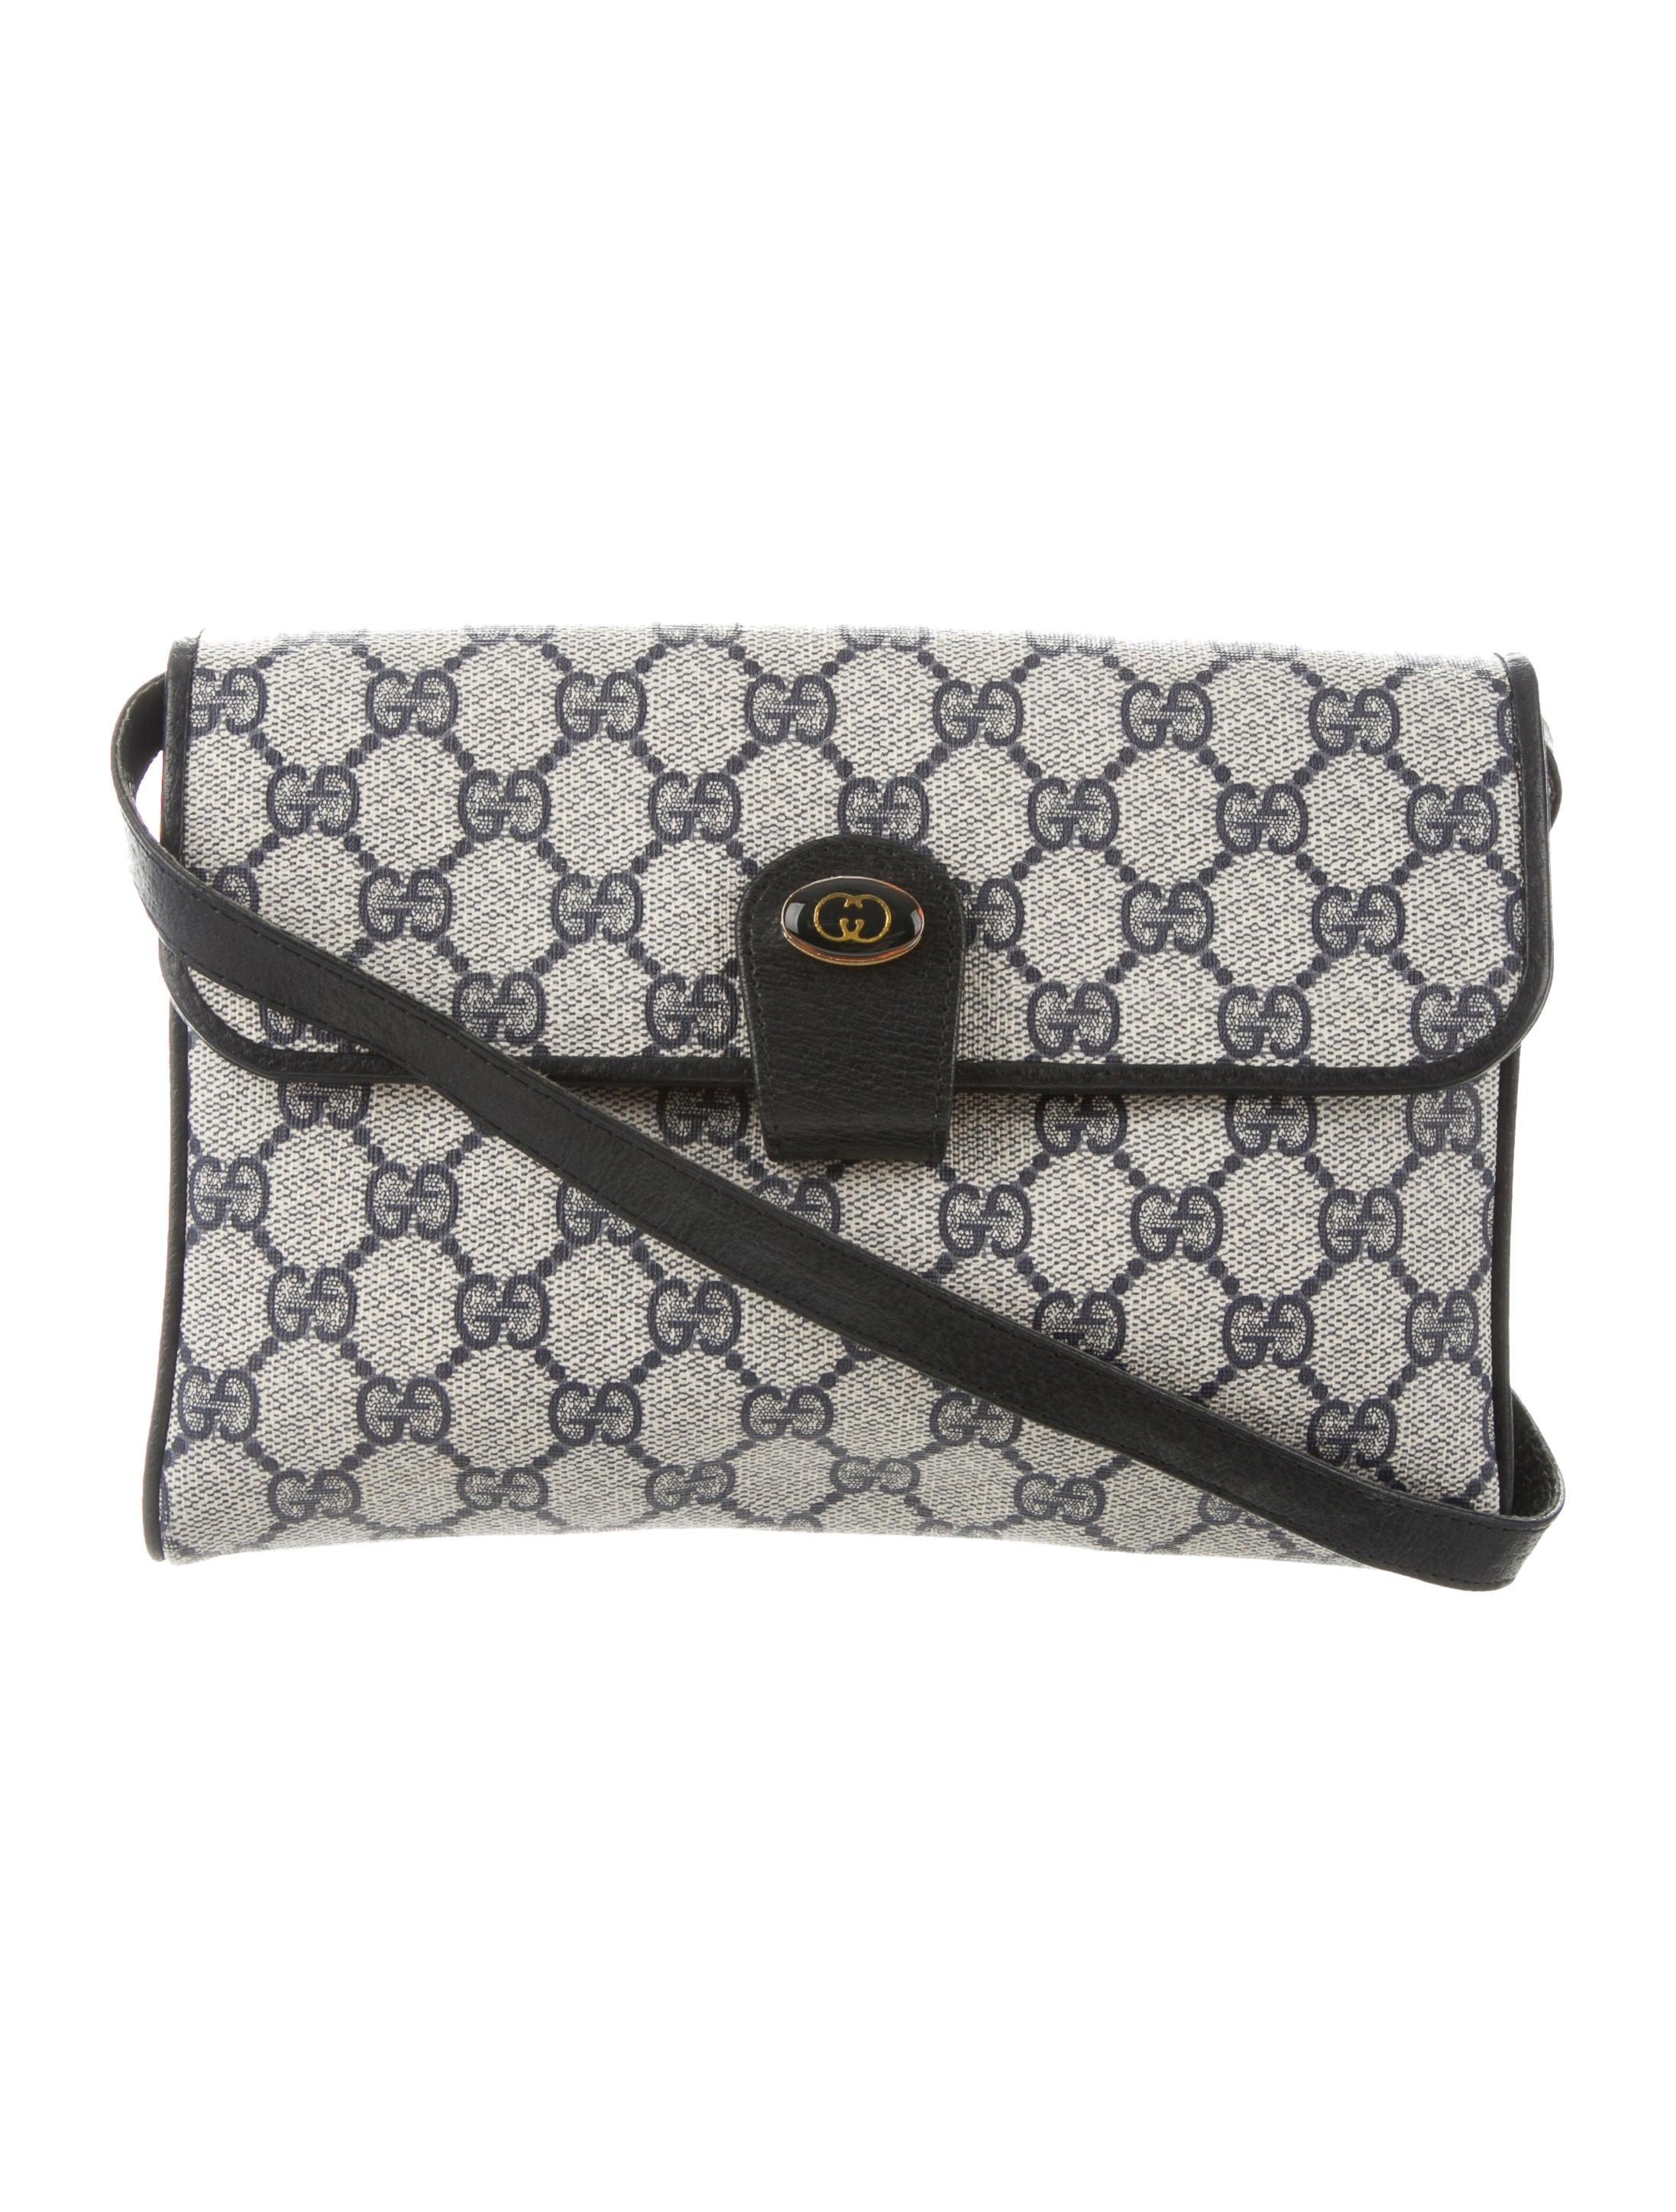 3419fa372760 Gucci Vintage GG Crossbody Bag - Handbags - GUC303244 | The RealReal